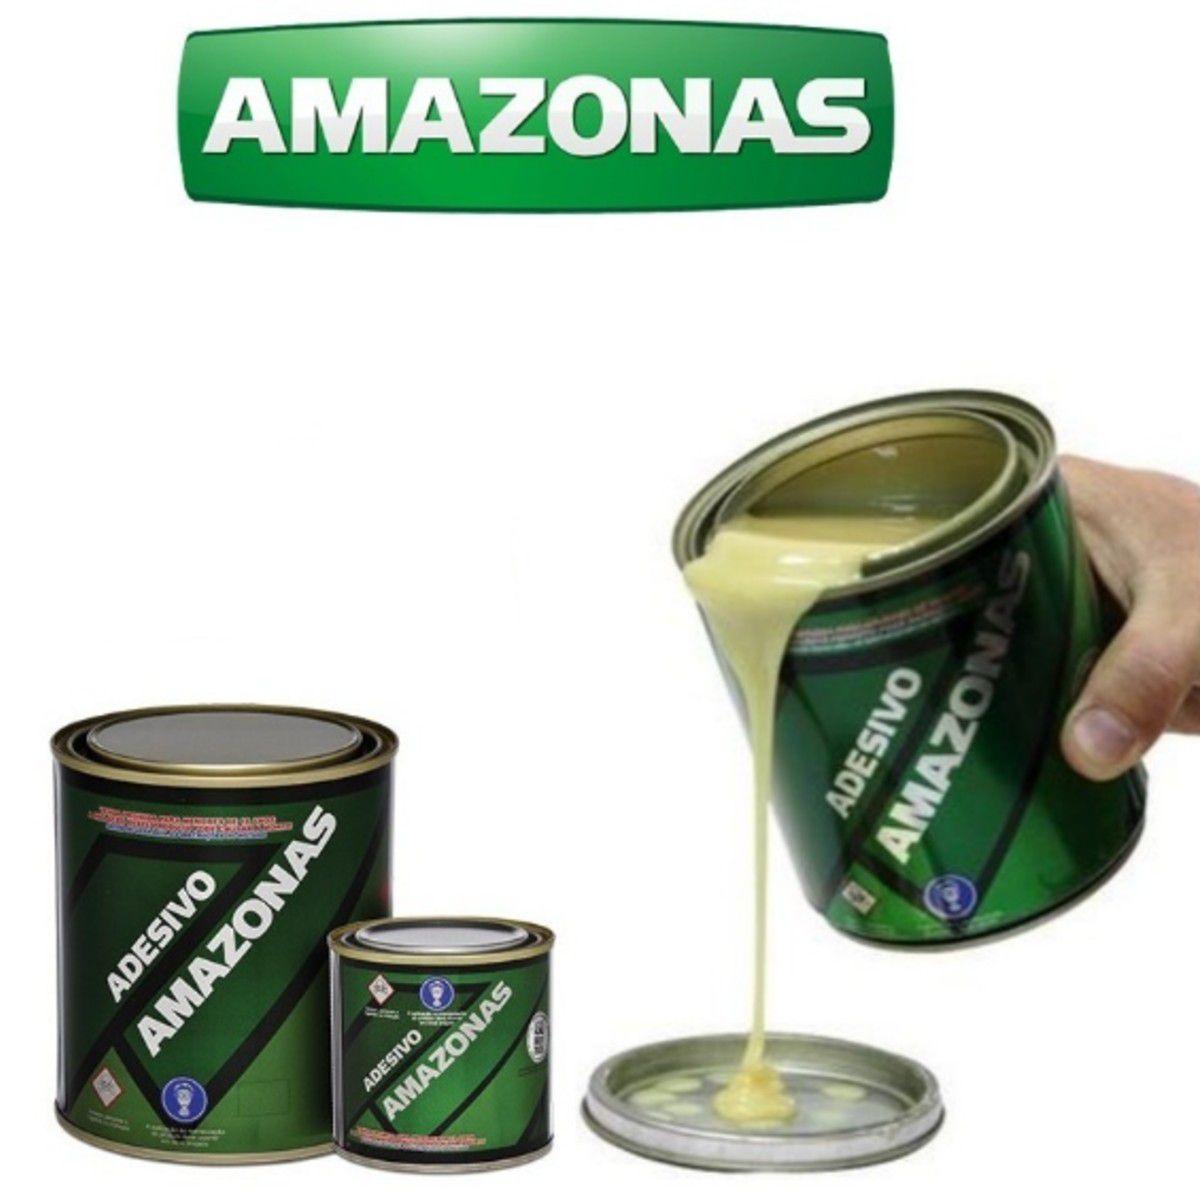 Cola Contato Extra Universal 750g De Sapateiro Amazonas